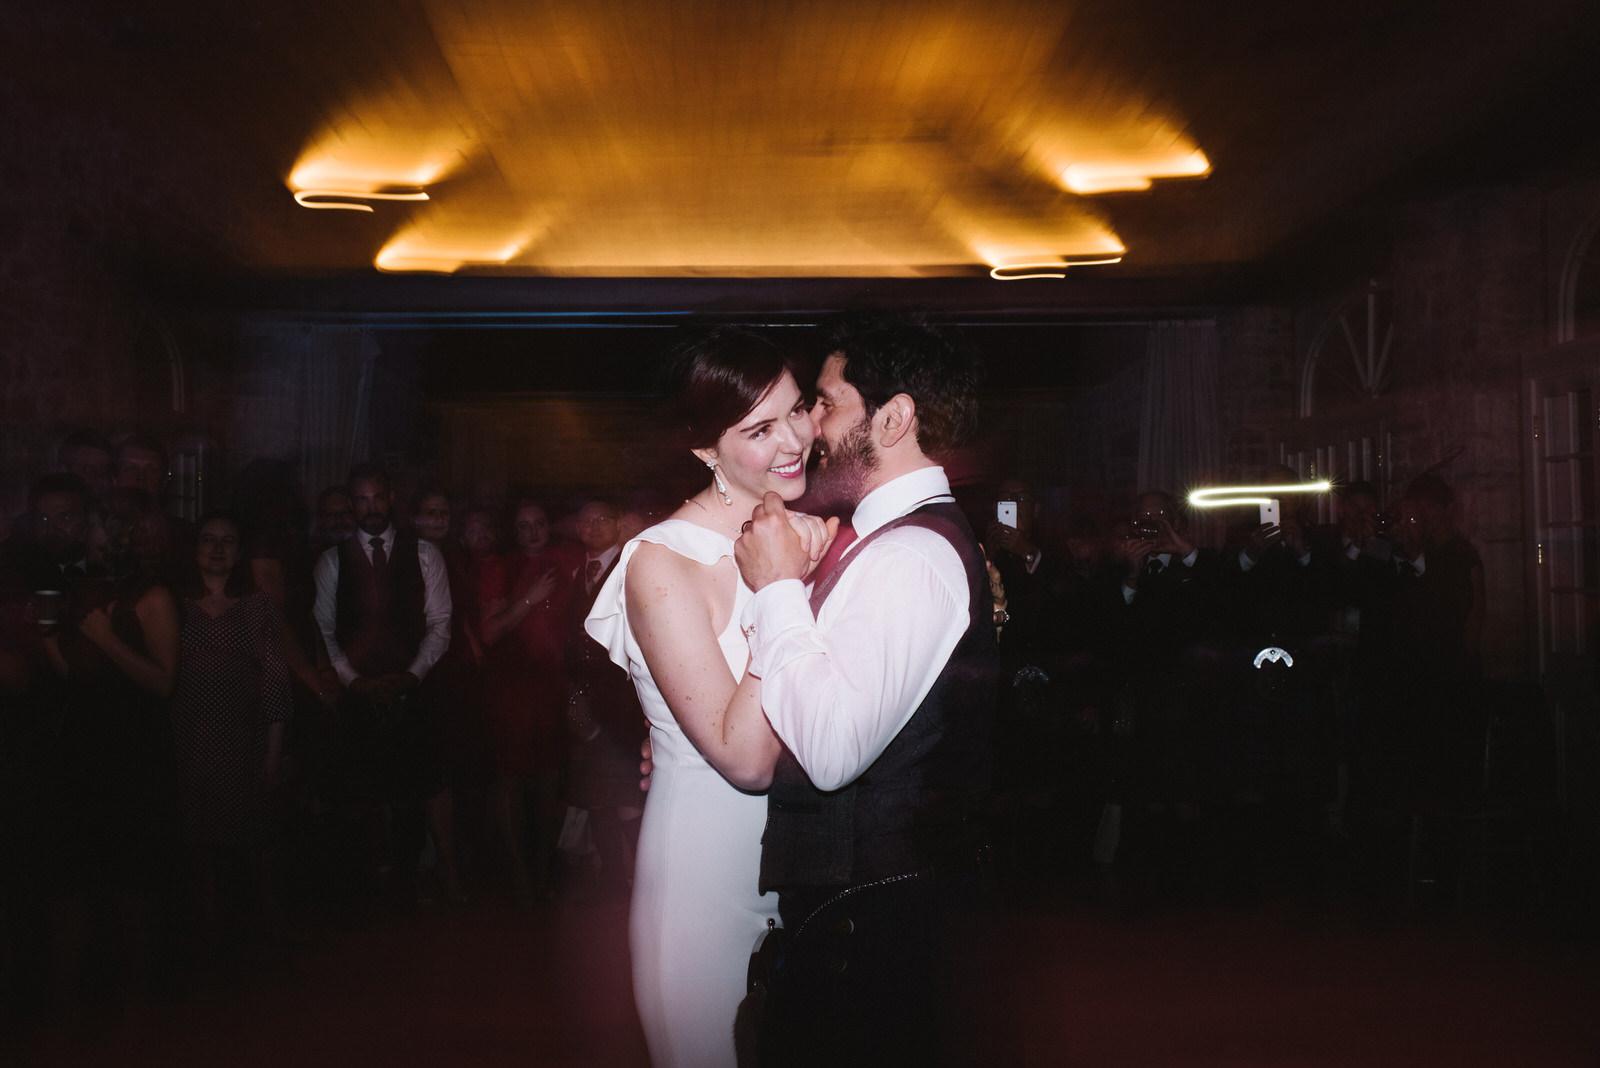 040-COLSTOUN-HOUSE-WEDDING-ALTERNATIVE-WEDDING-PHOTOGRAPHER-GLASGOW-WEDDING-PHOTOGRAPHER-STYLISH-SCOTTISH-WEDDING.JPG